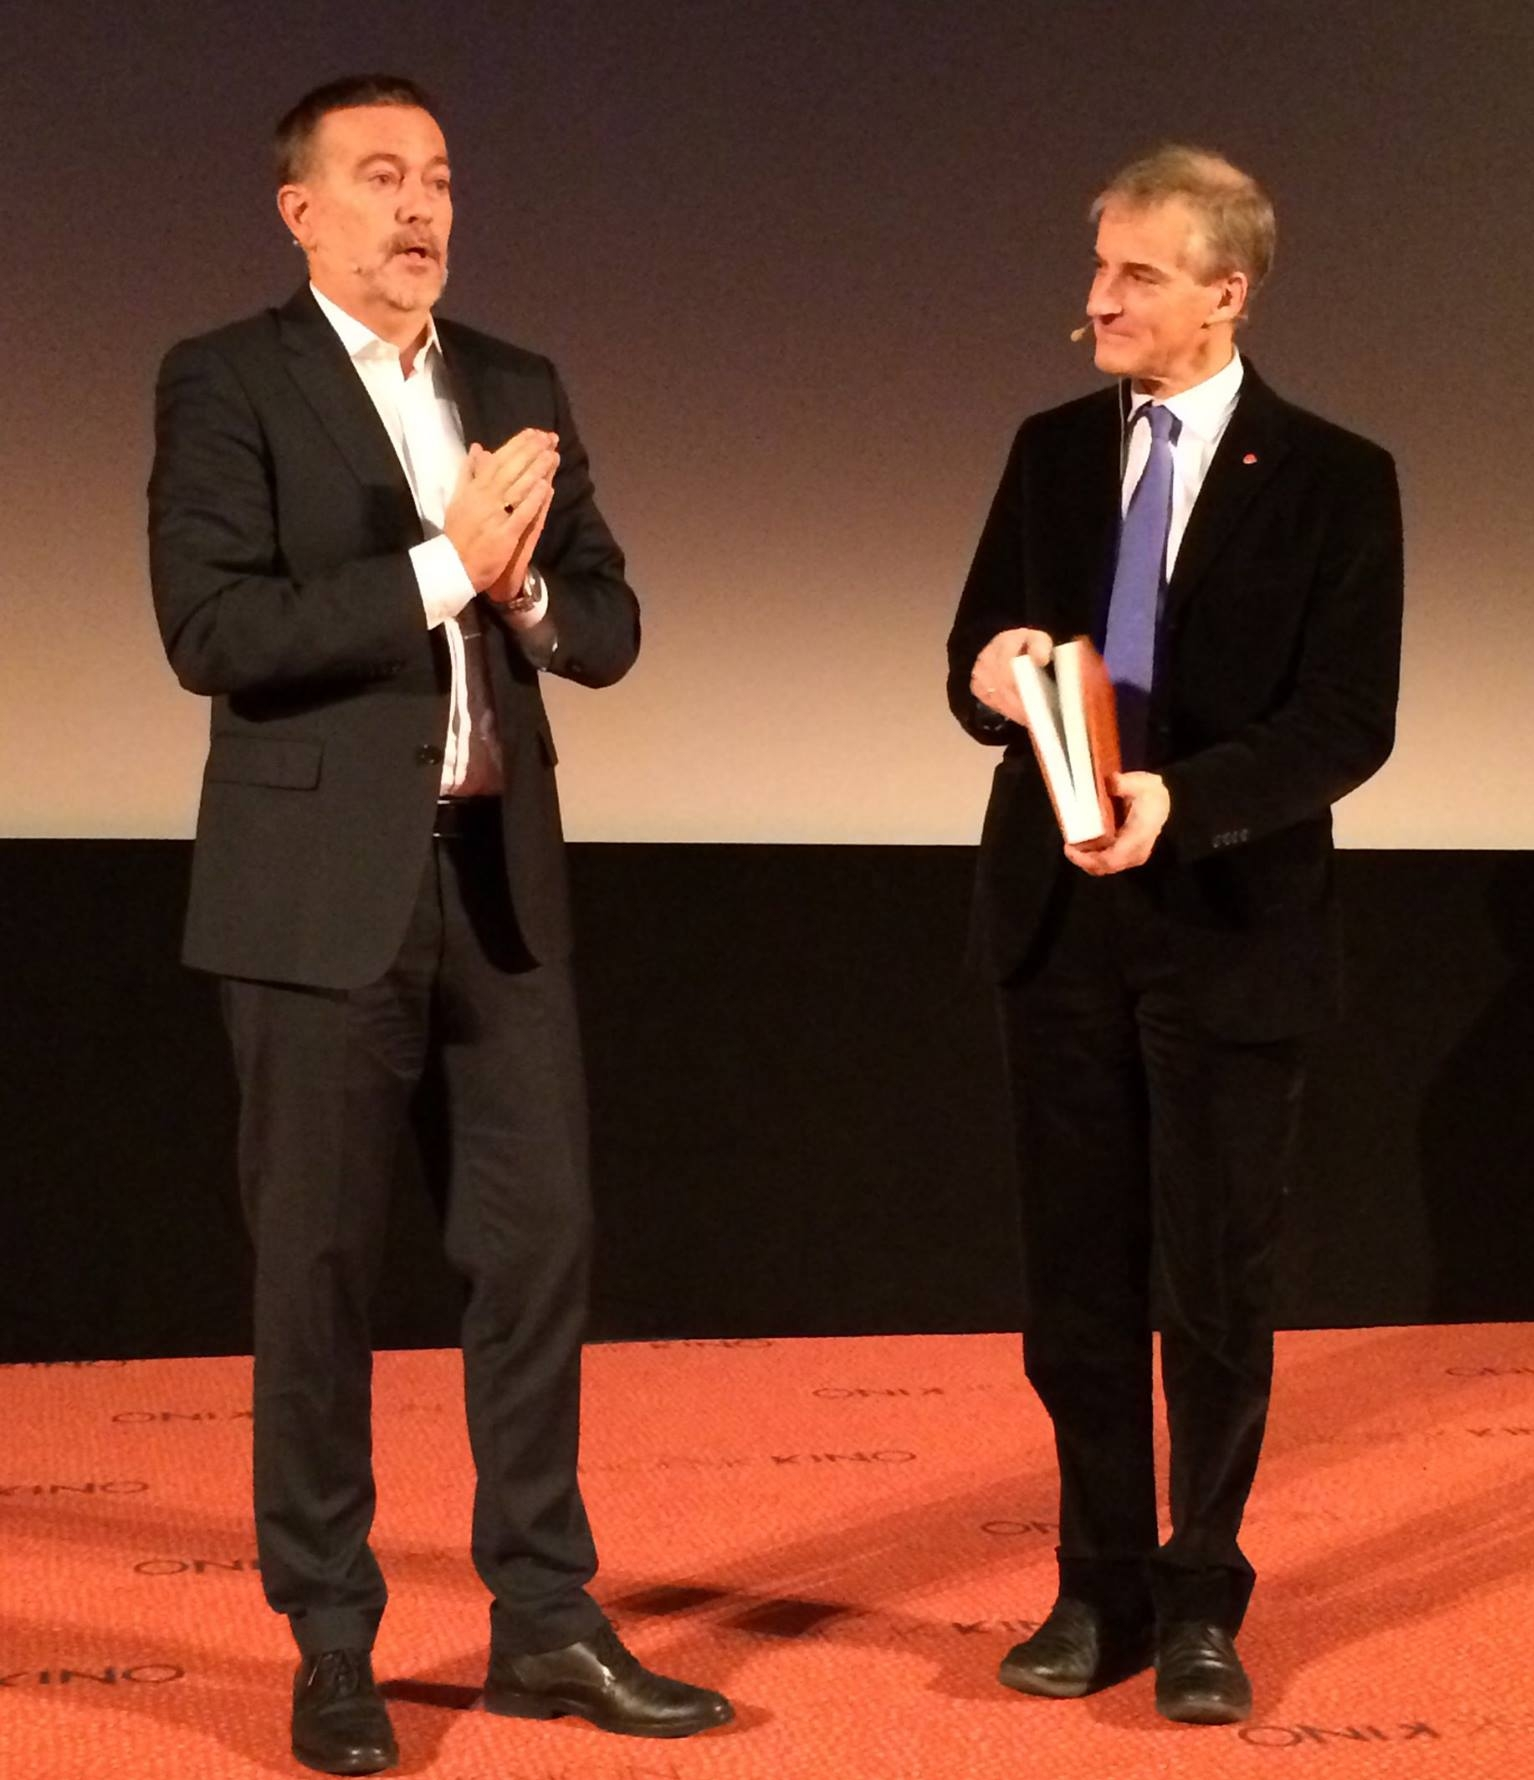 Norwegian Labour Party leader Jonas Gahr Støre with Flateyjarbok.